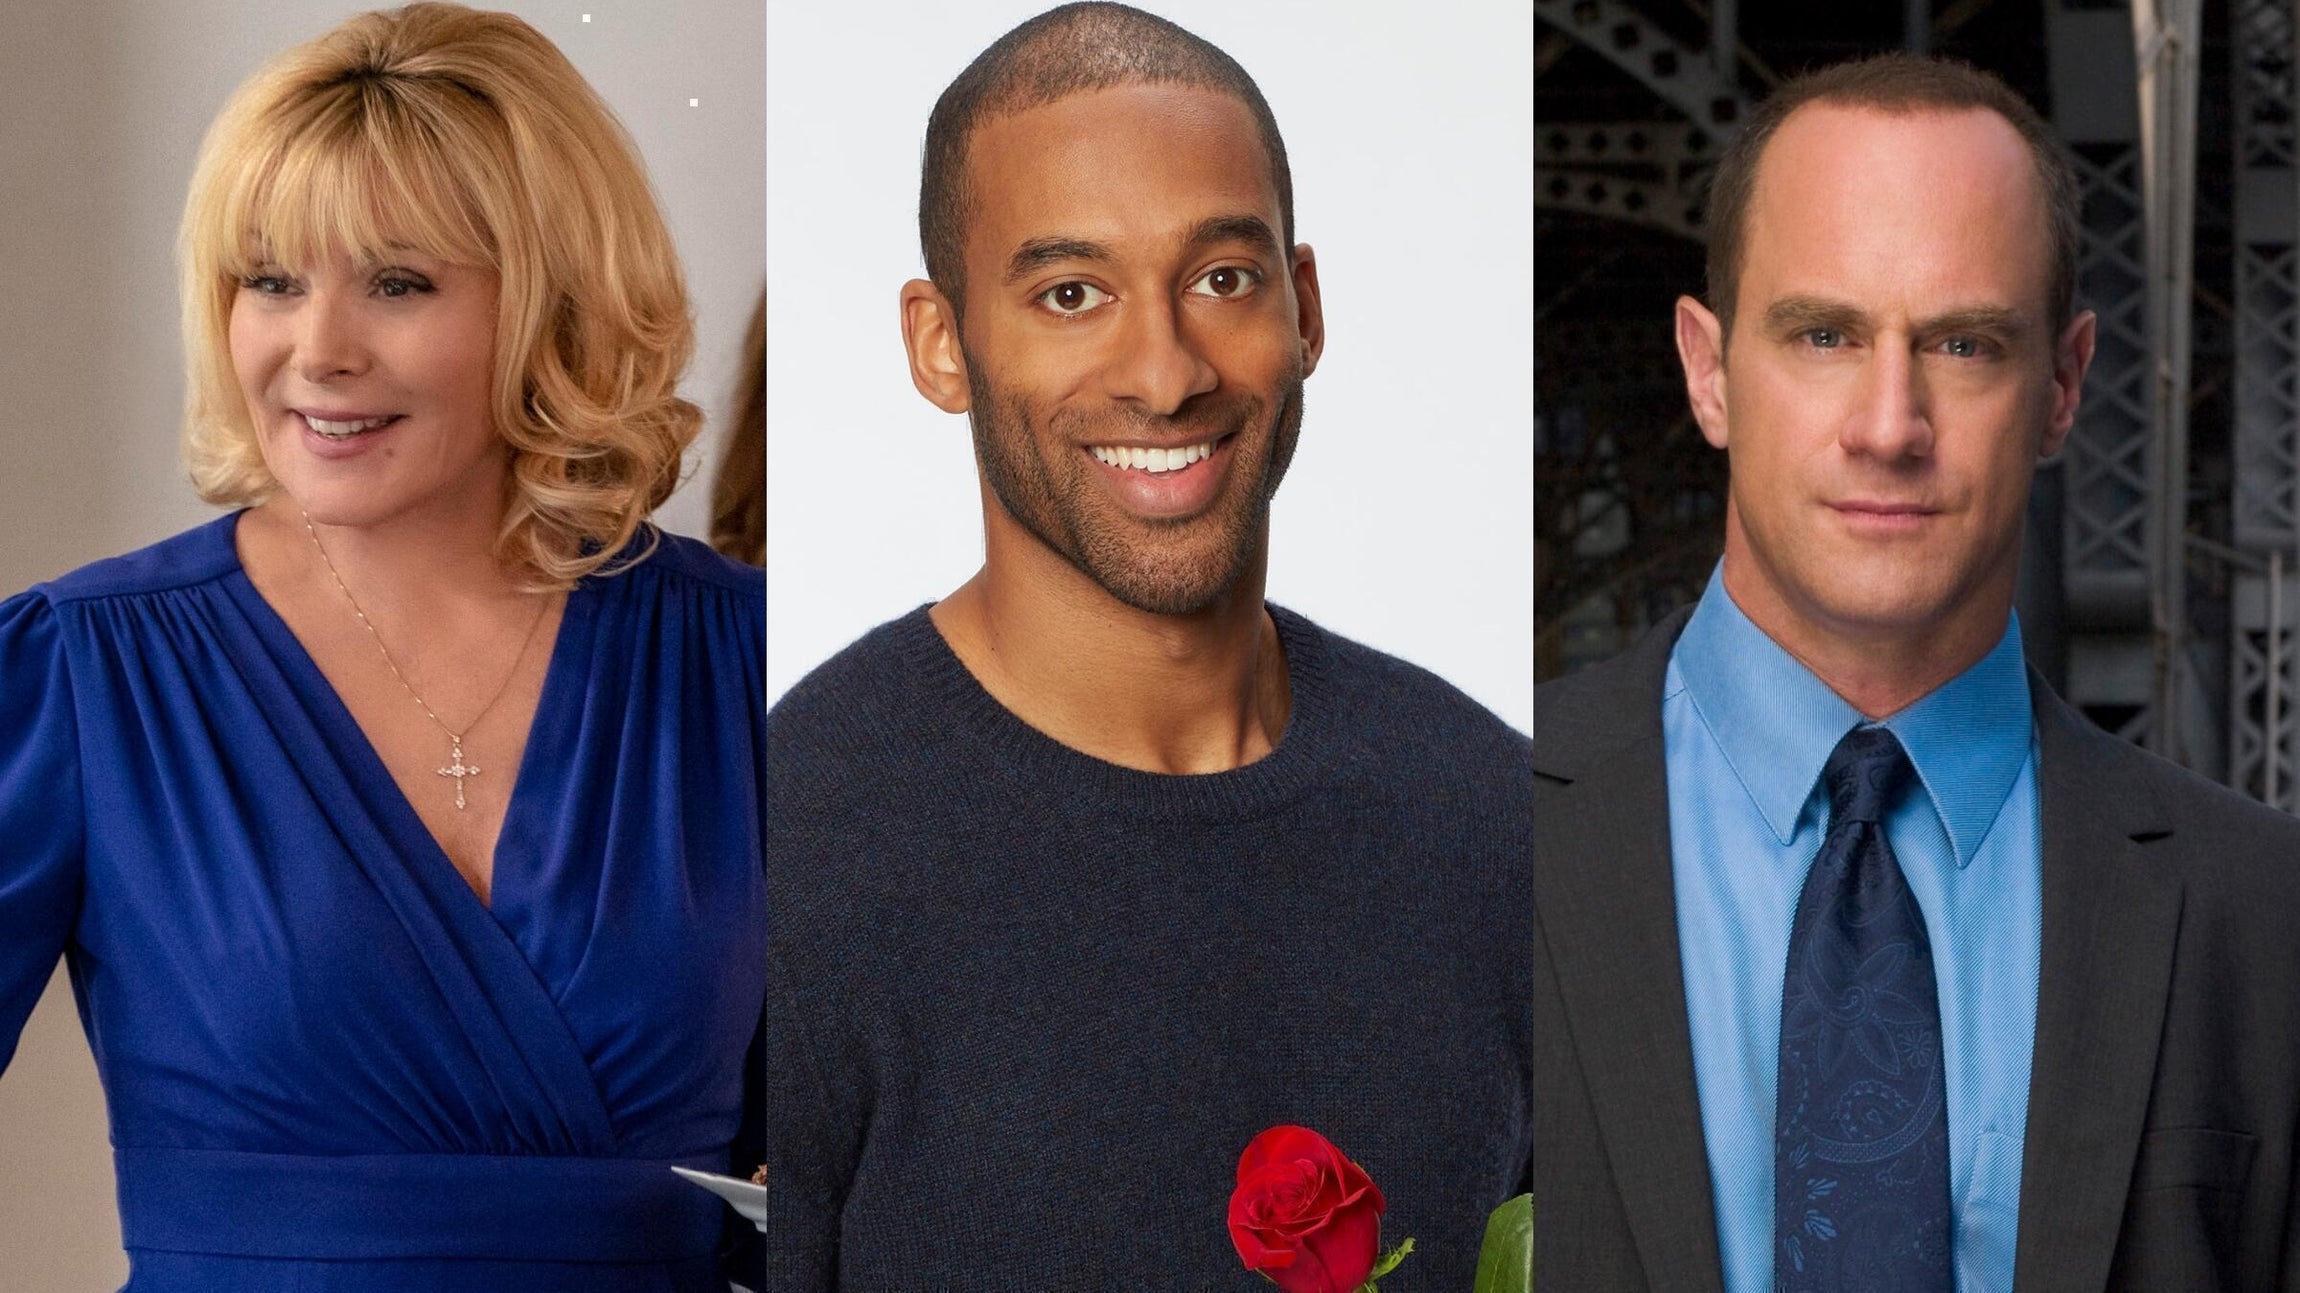 Kim Cattrall, Filthy Rich; Matt James, The Bachelor; Christopher Meloni, Law & Order: SVU